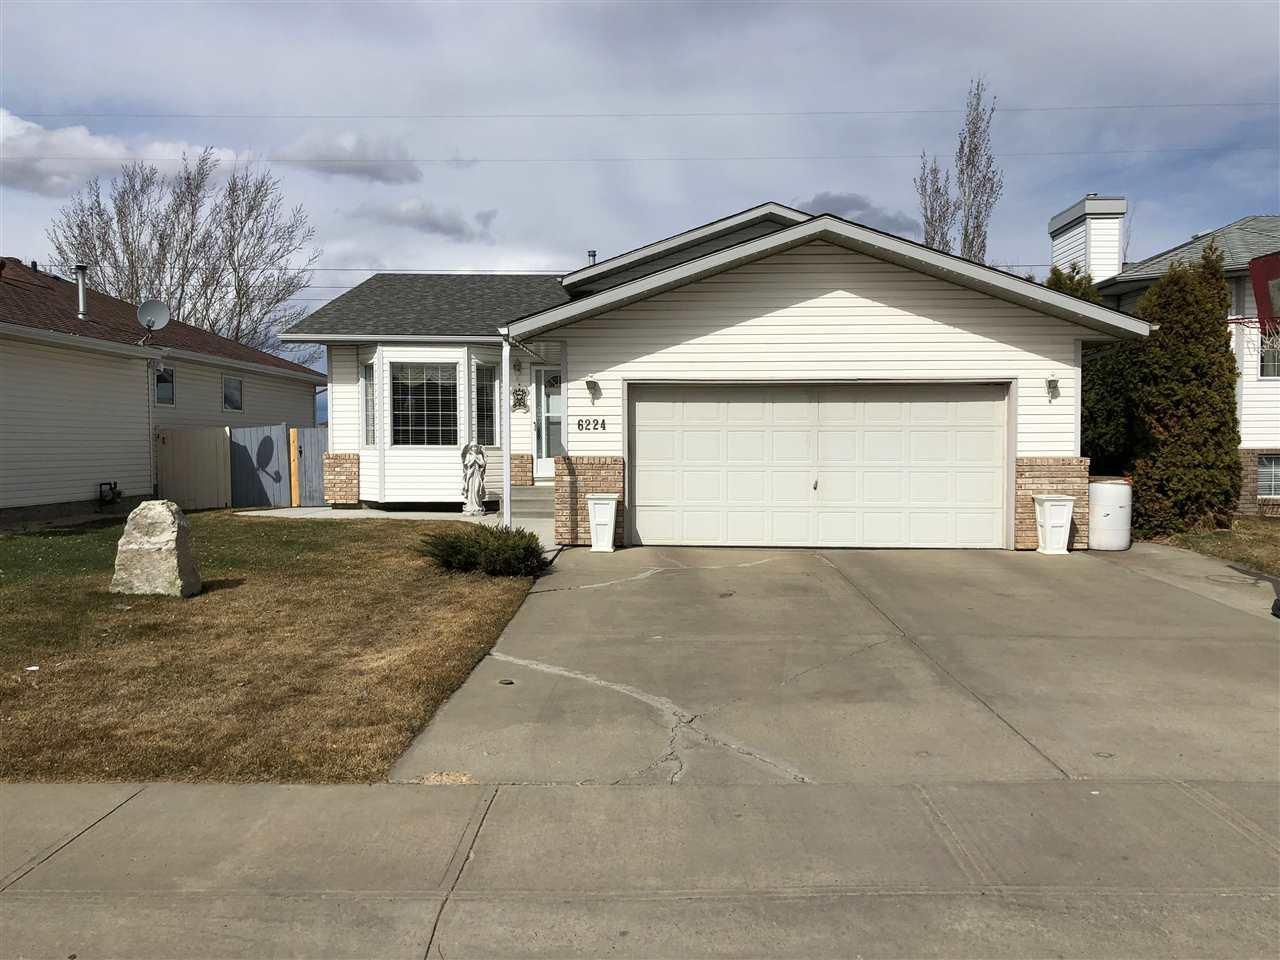 Main Photo: 6224 162B Avenue in Edmonton: Zone 03 House for sale : MLS®# E4153631